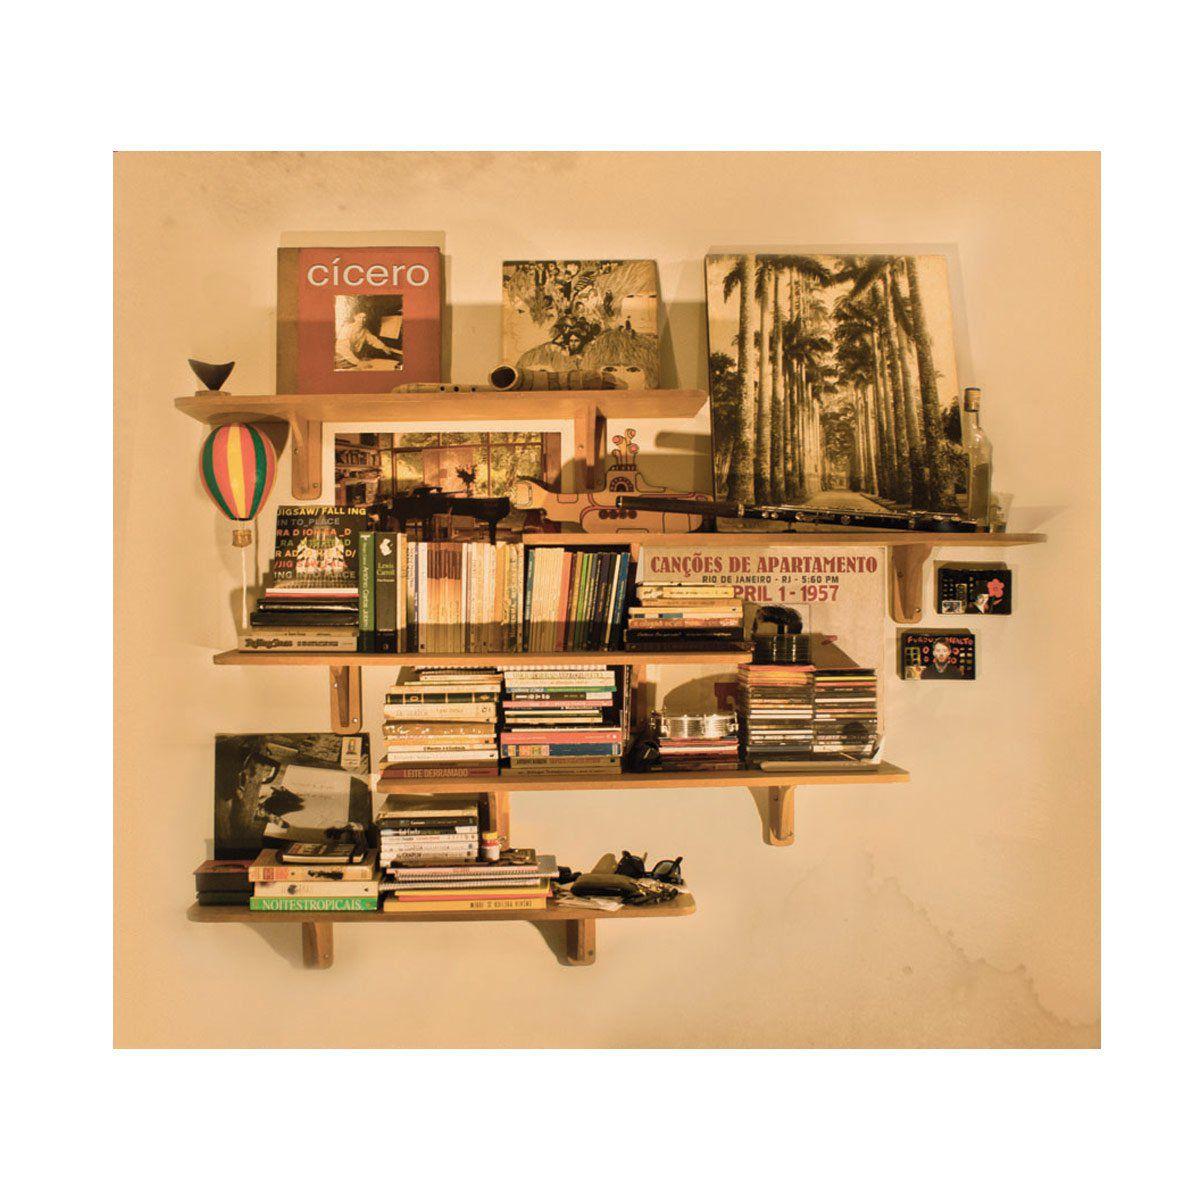 LP Cícero Canções de Apartamento  - bandUP Store Marketplace